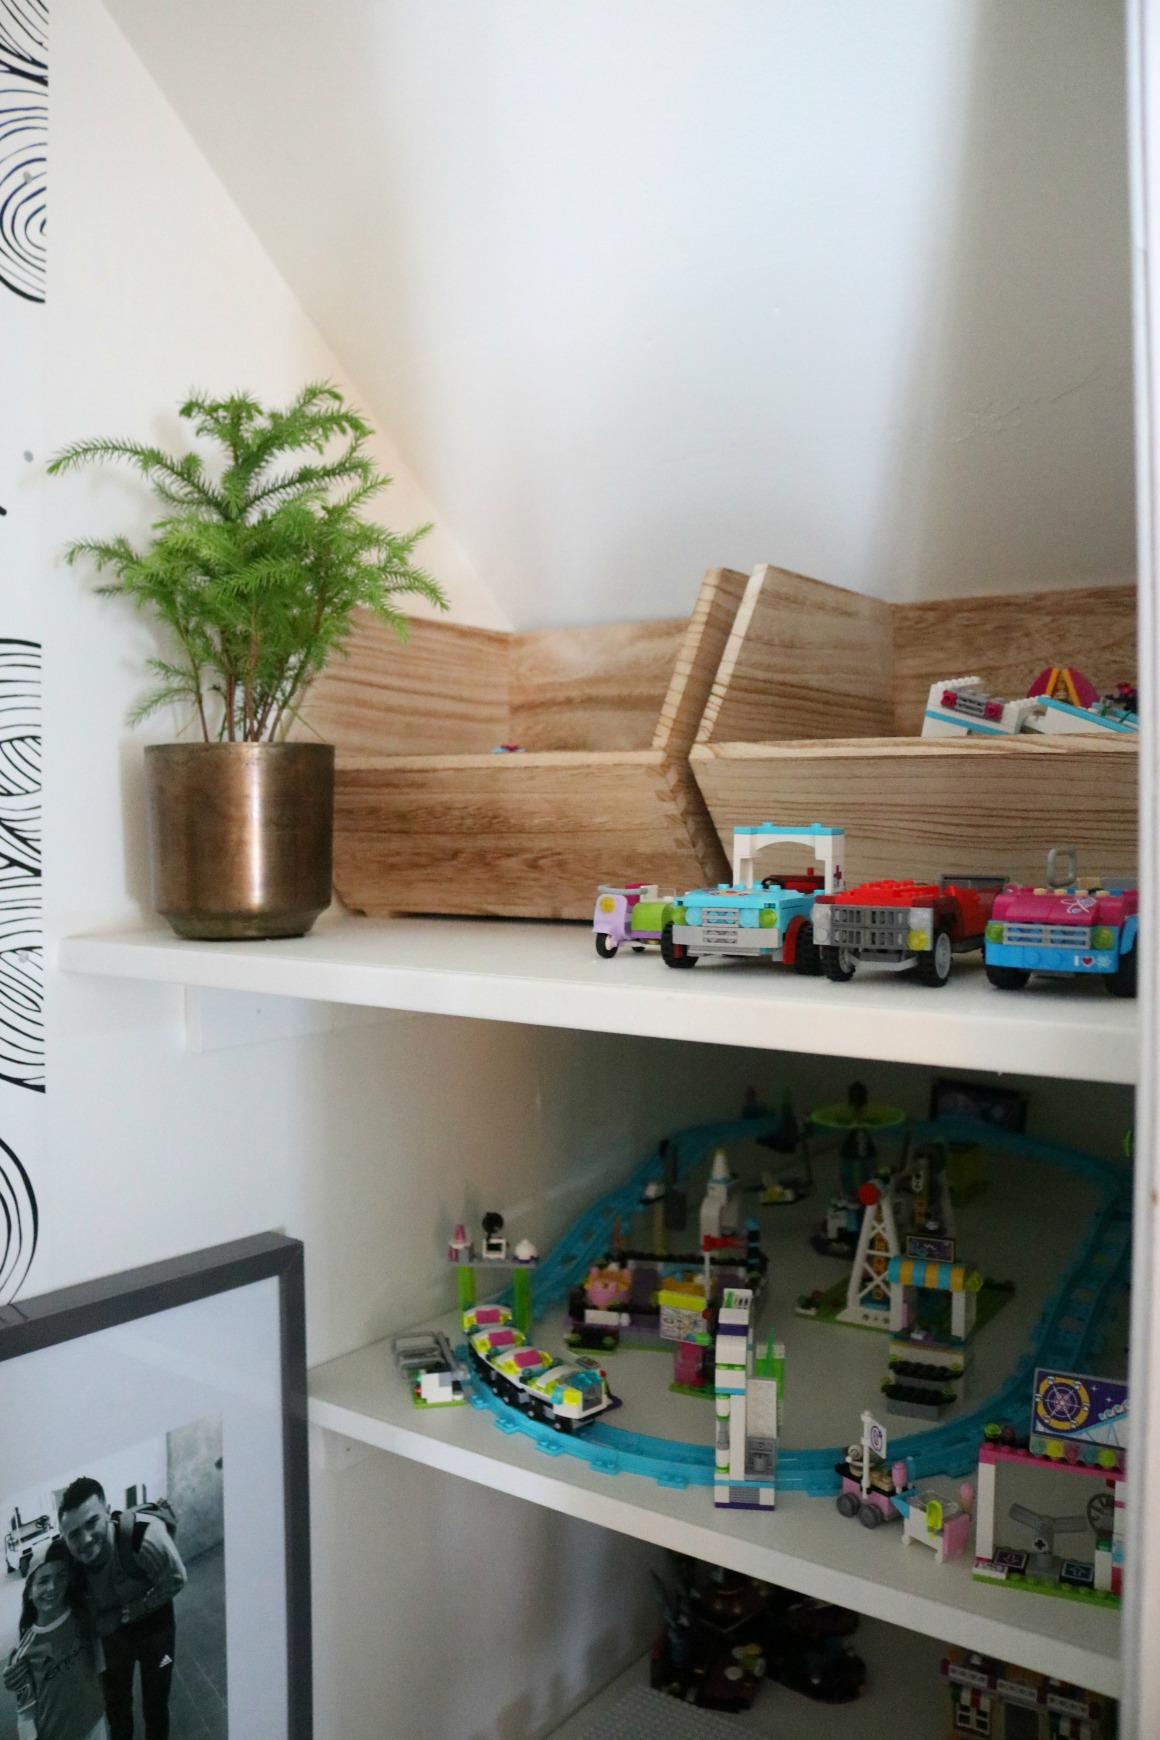 Lego Storage Solution- Closet Turned Lego Room